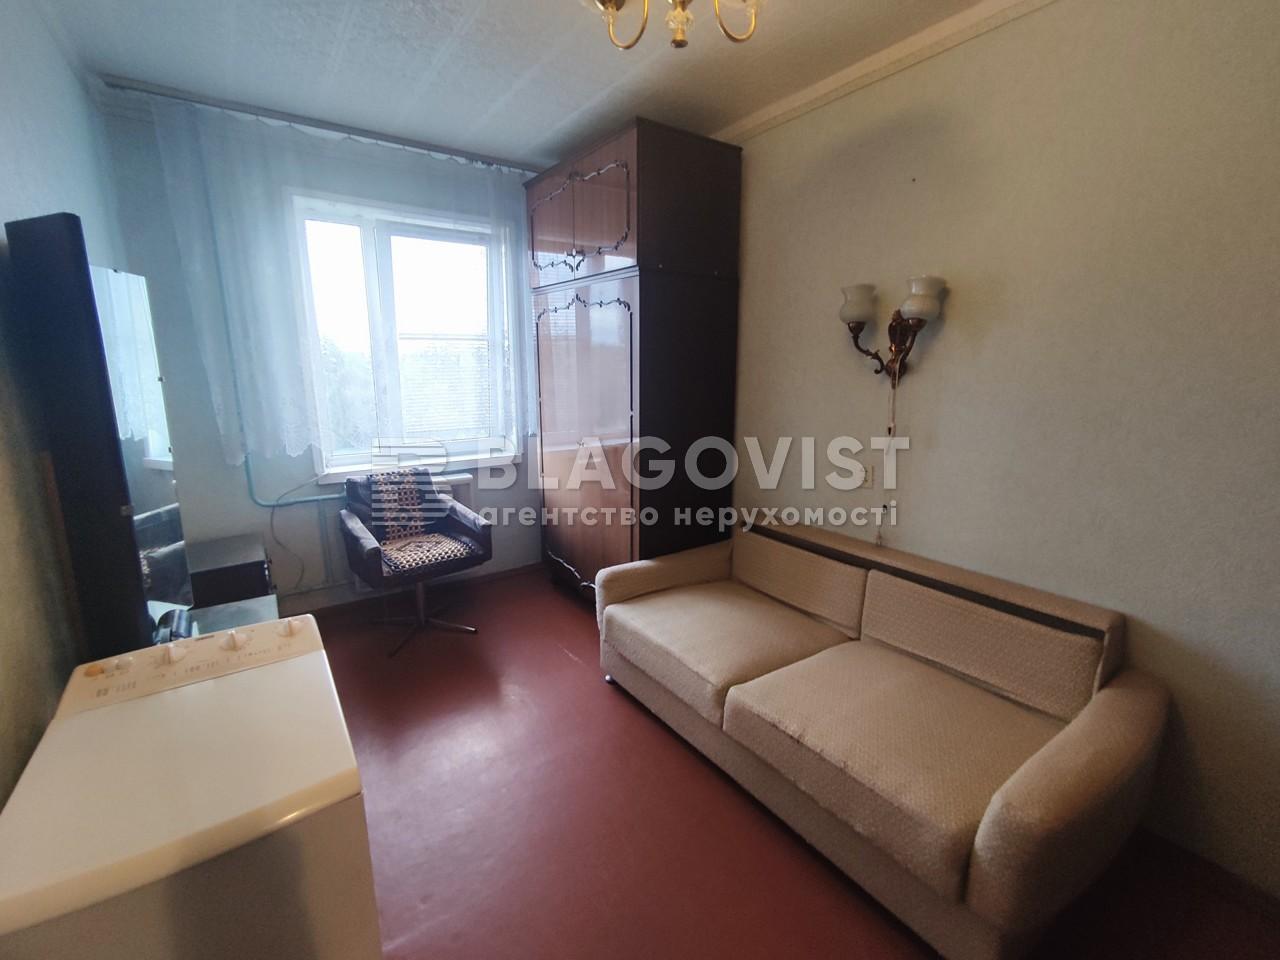 Квартира Z-807904, Приречная, 17, Киев - Фото 8